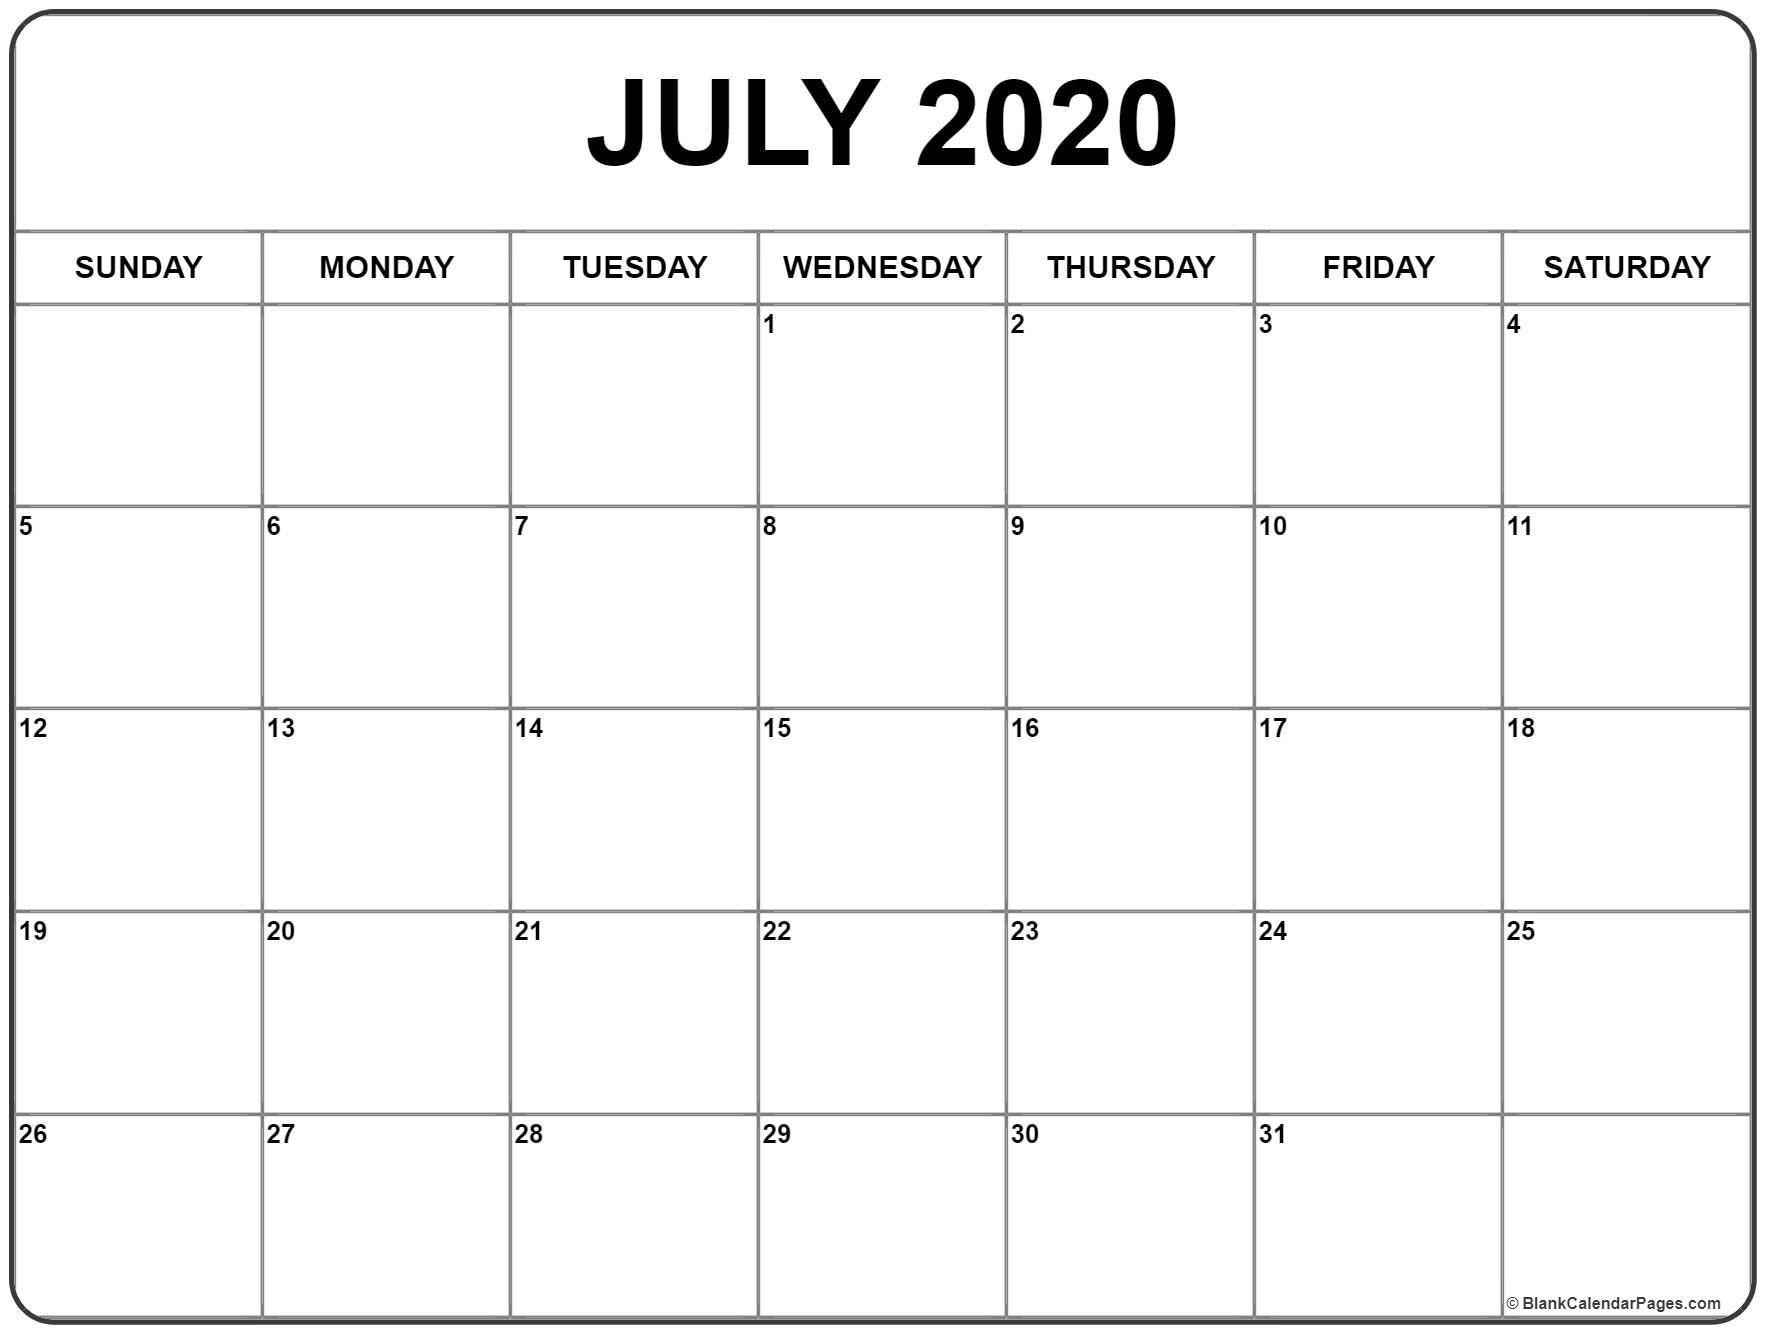 July 2020 Calendar | Printable Calendars | Blank Monthly  Printable Full Size Septmeber 2020 Calendar